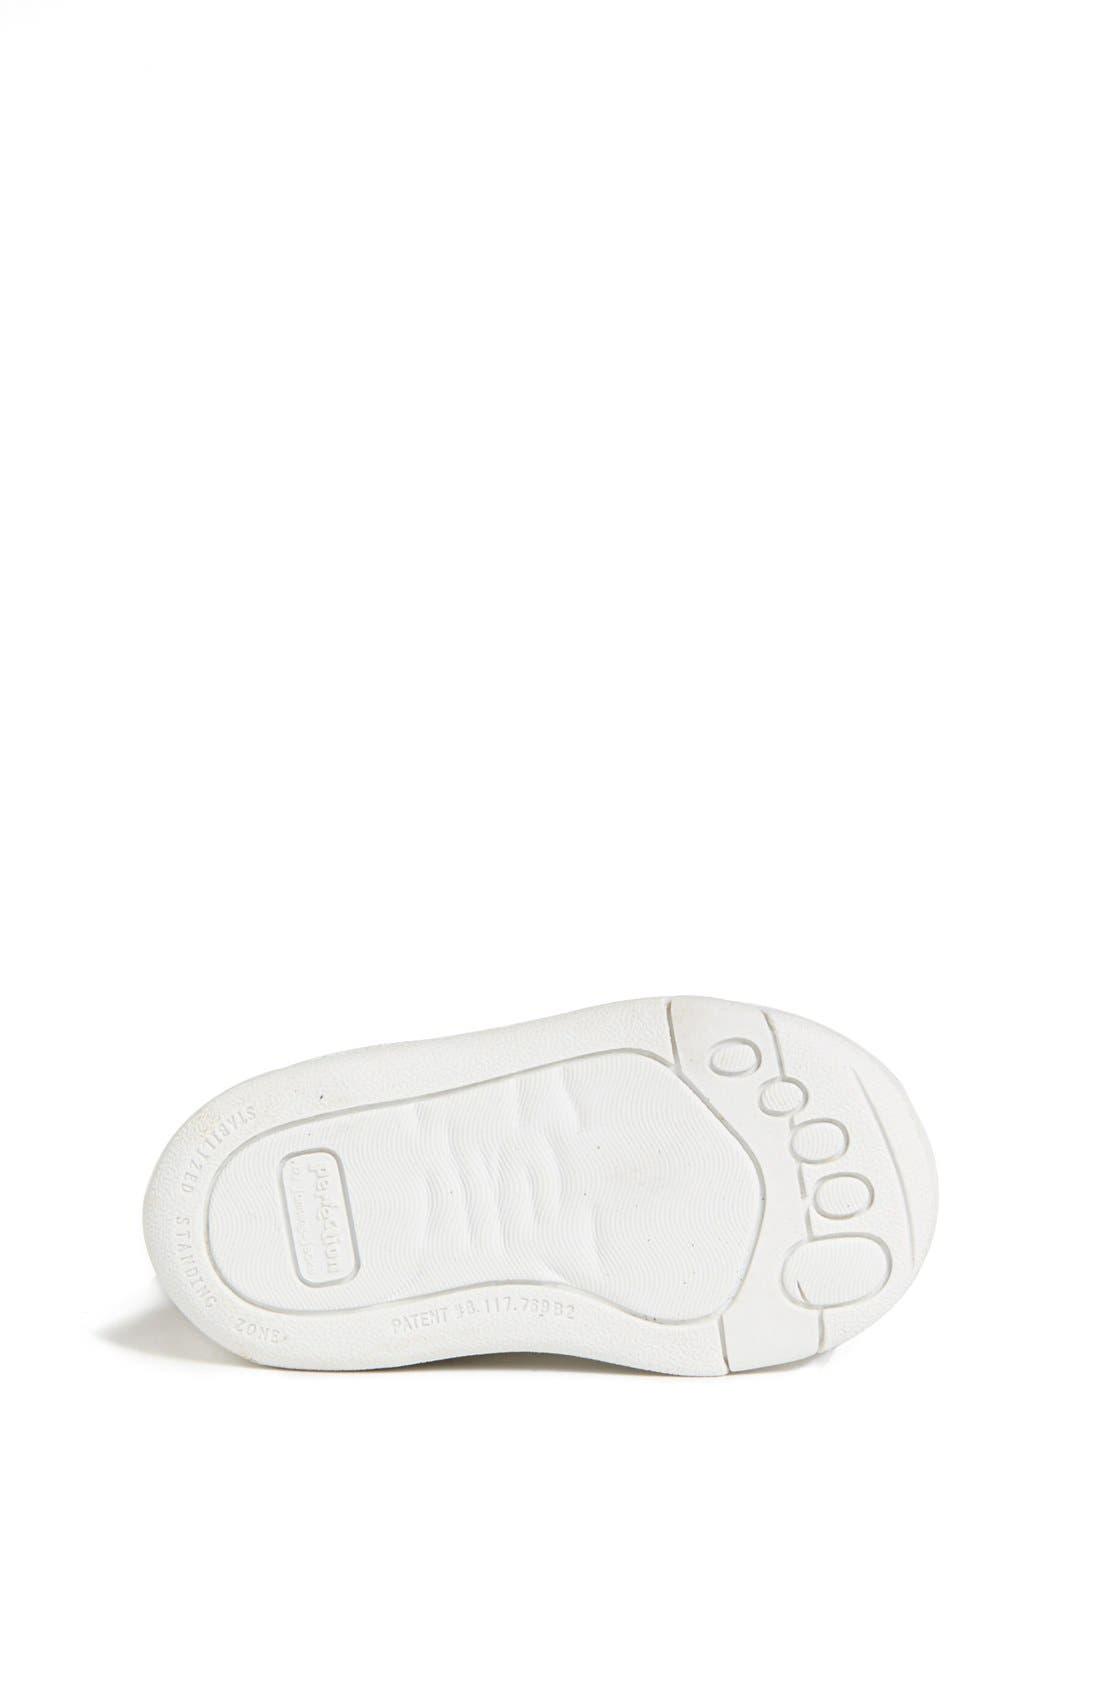 Alternate Image 4  - Jumping Jacks 'Perfection' Sneaker (Baby, Walker & Toddler)